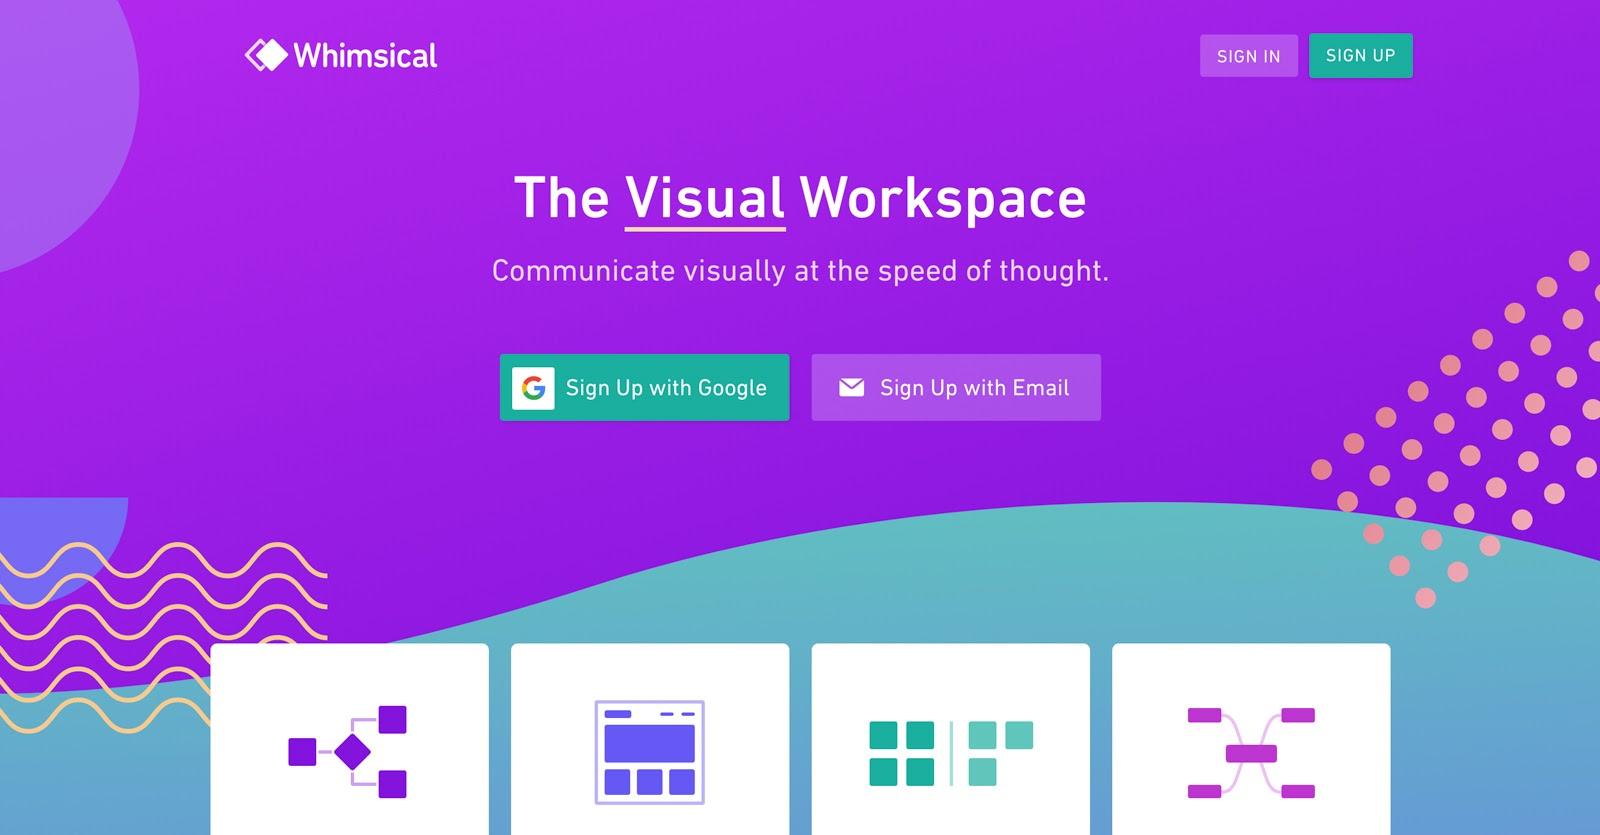 whimsical's visual workspace